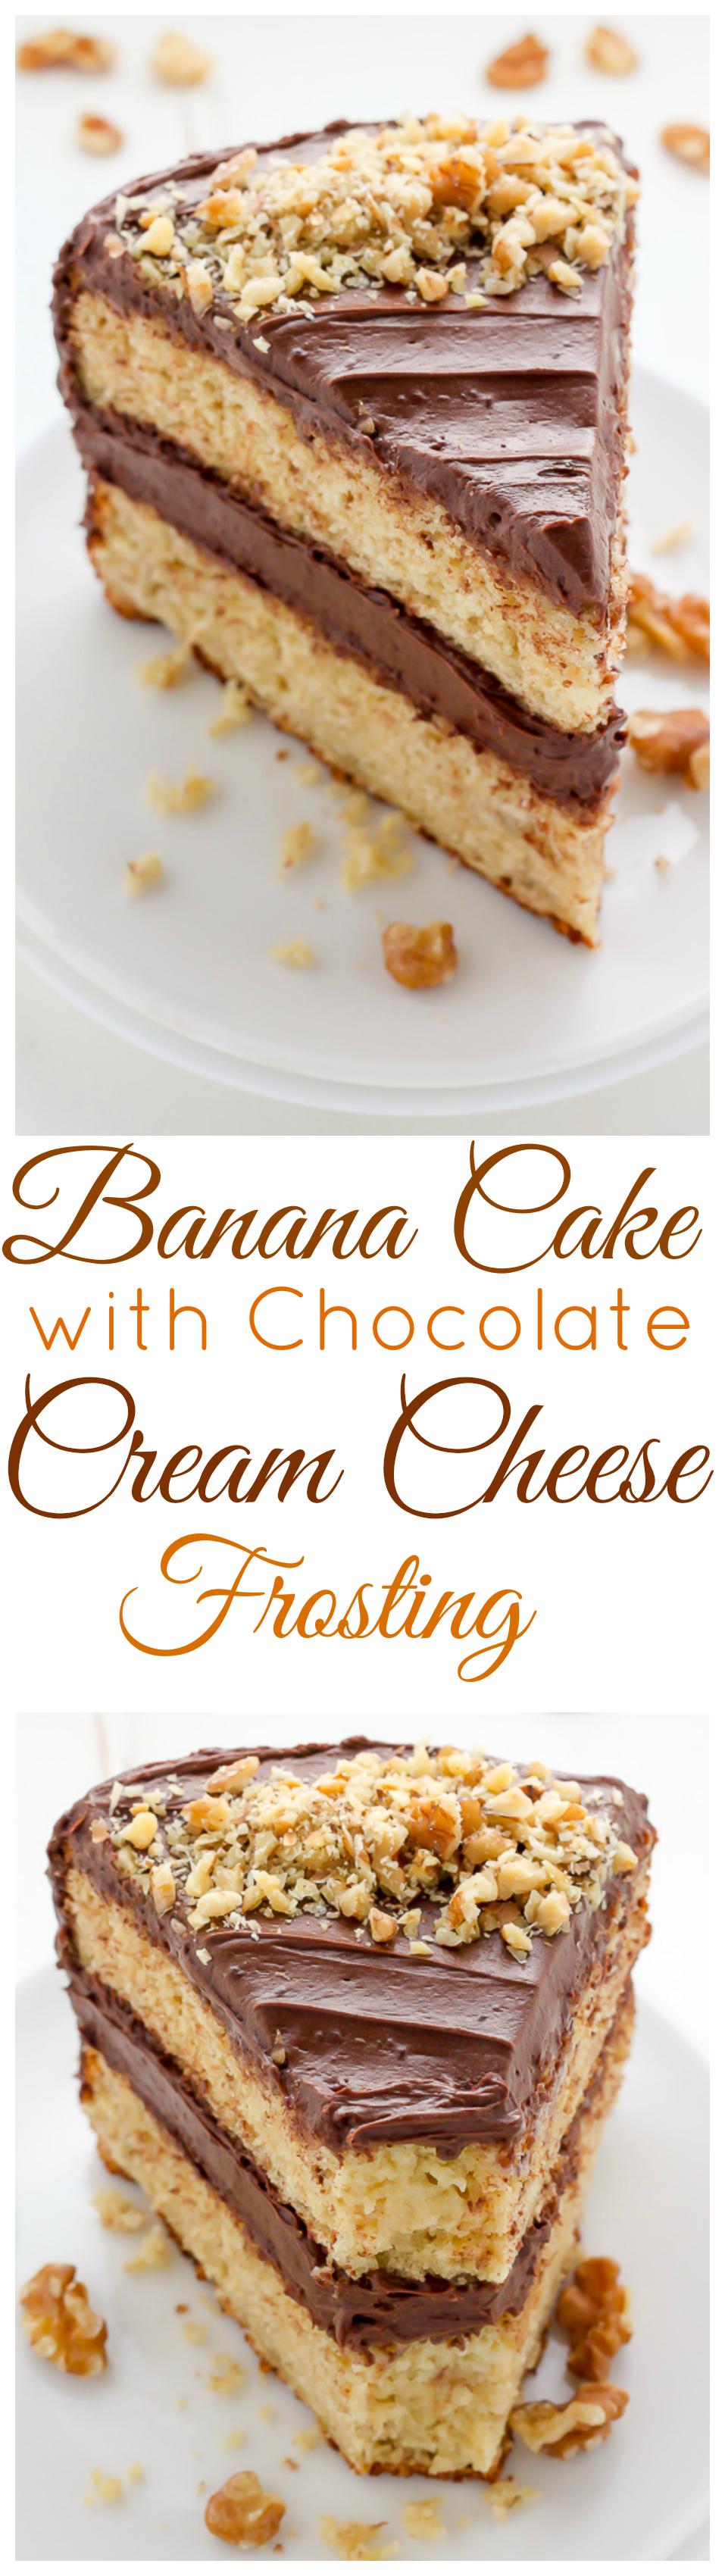 Old-Fashioned Banana Cake with Chocolate Cream Cheese ...